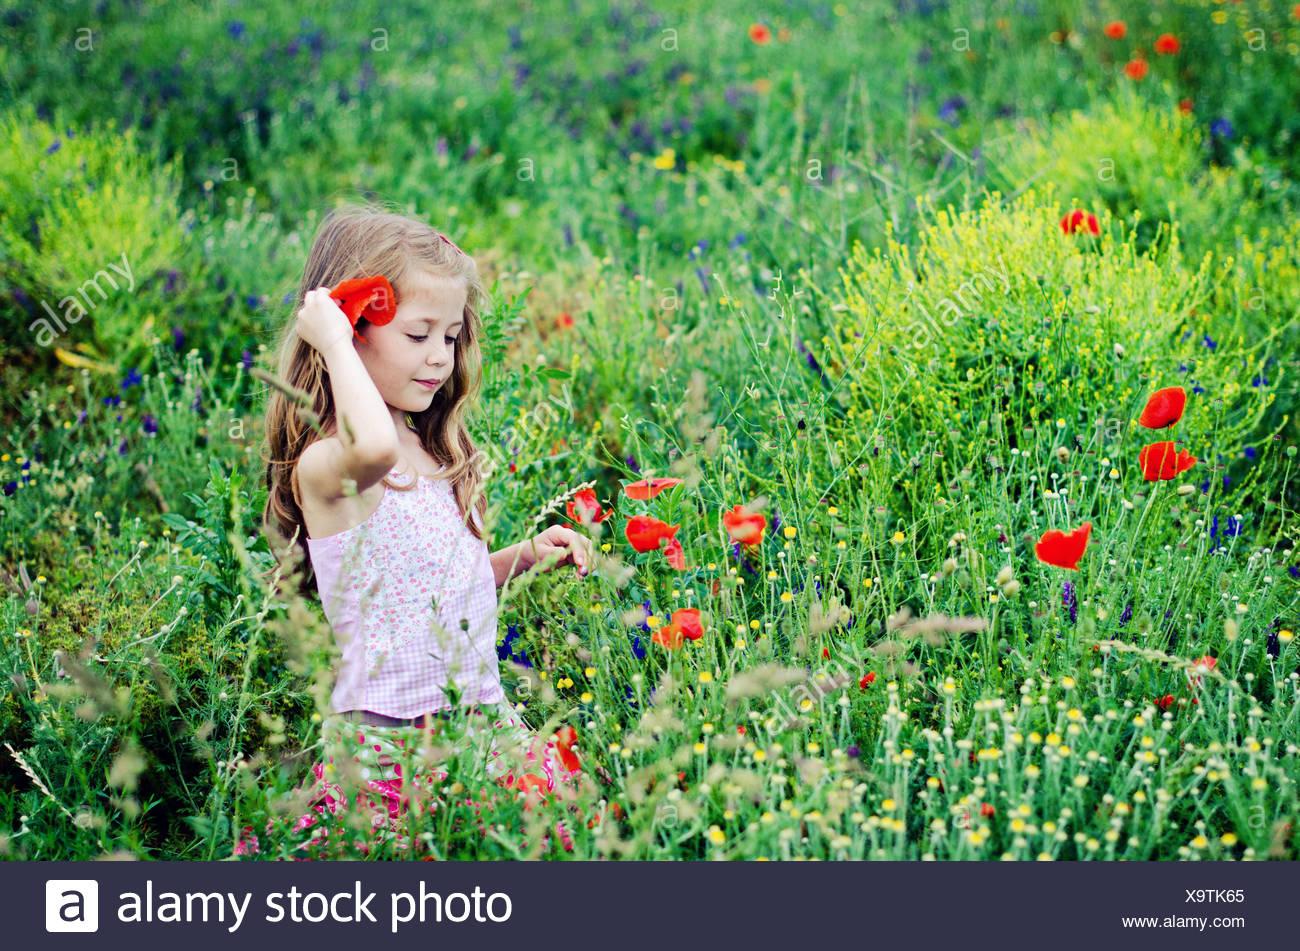 Girl walking through a poppy field - Stock Image